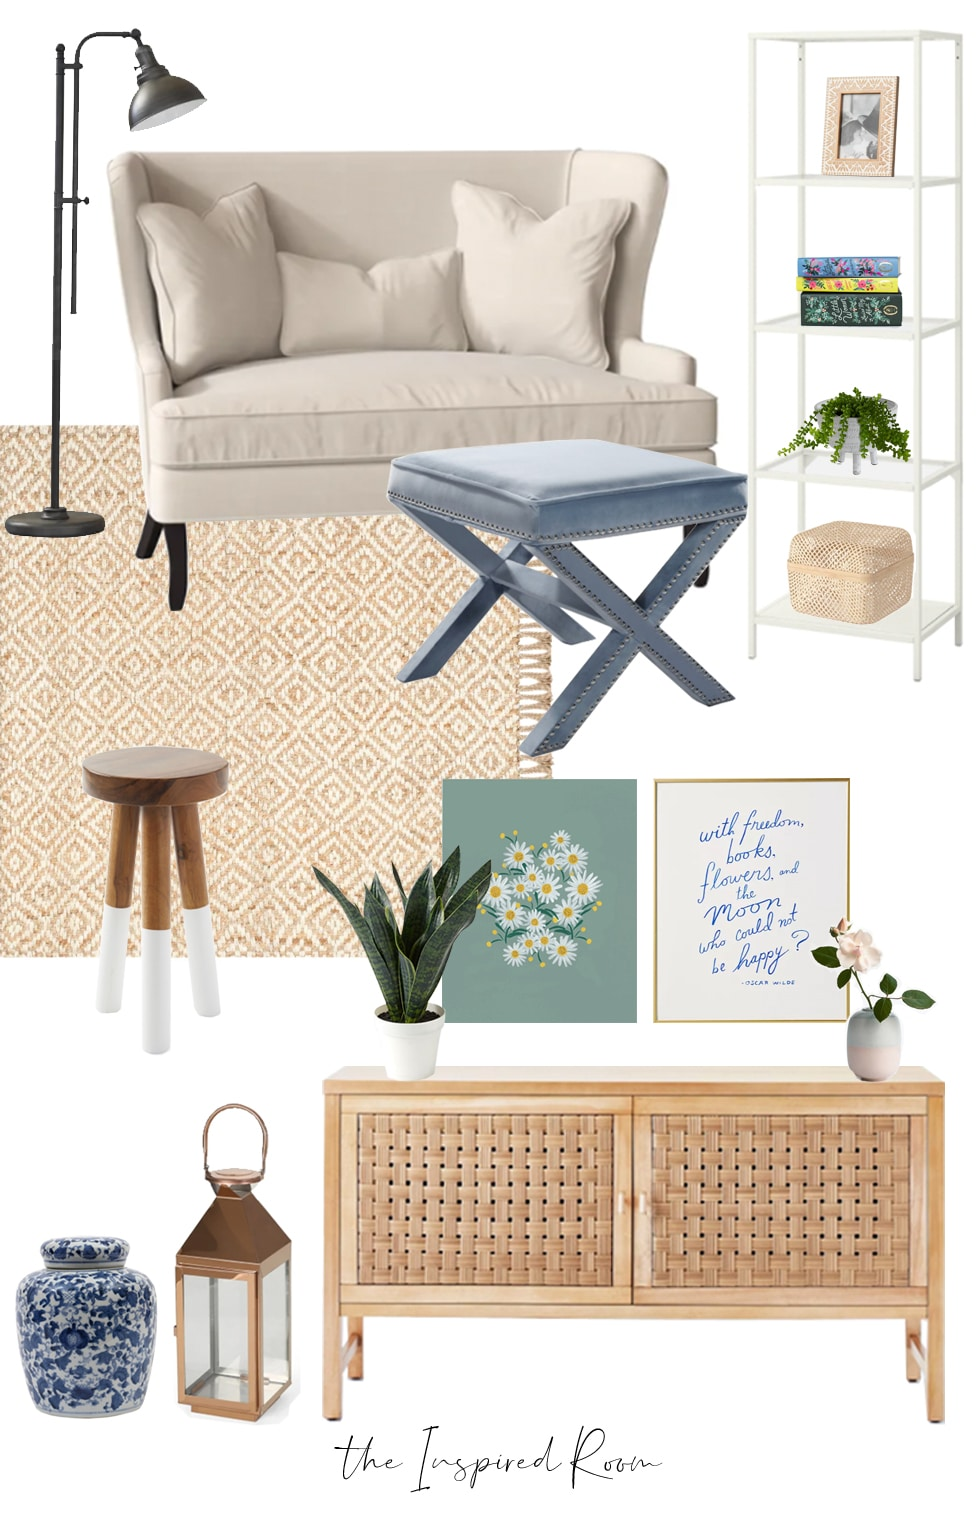 Courtney's New Apartment Tour + Design Plans + Mood Boards